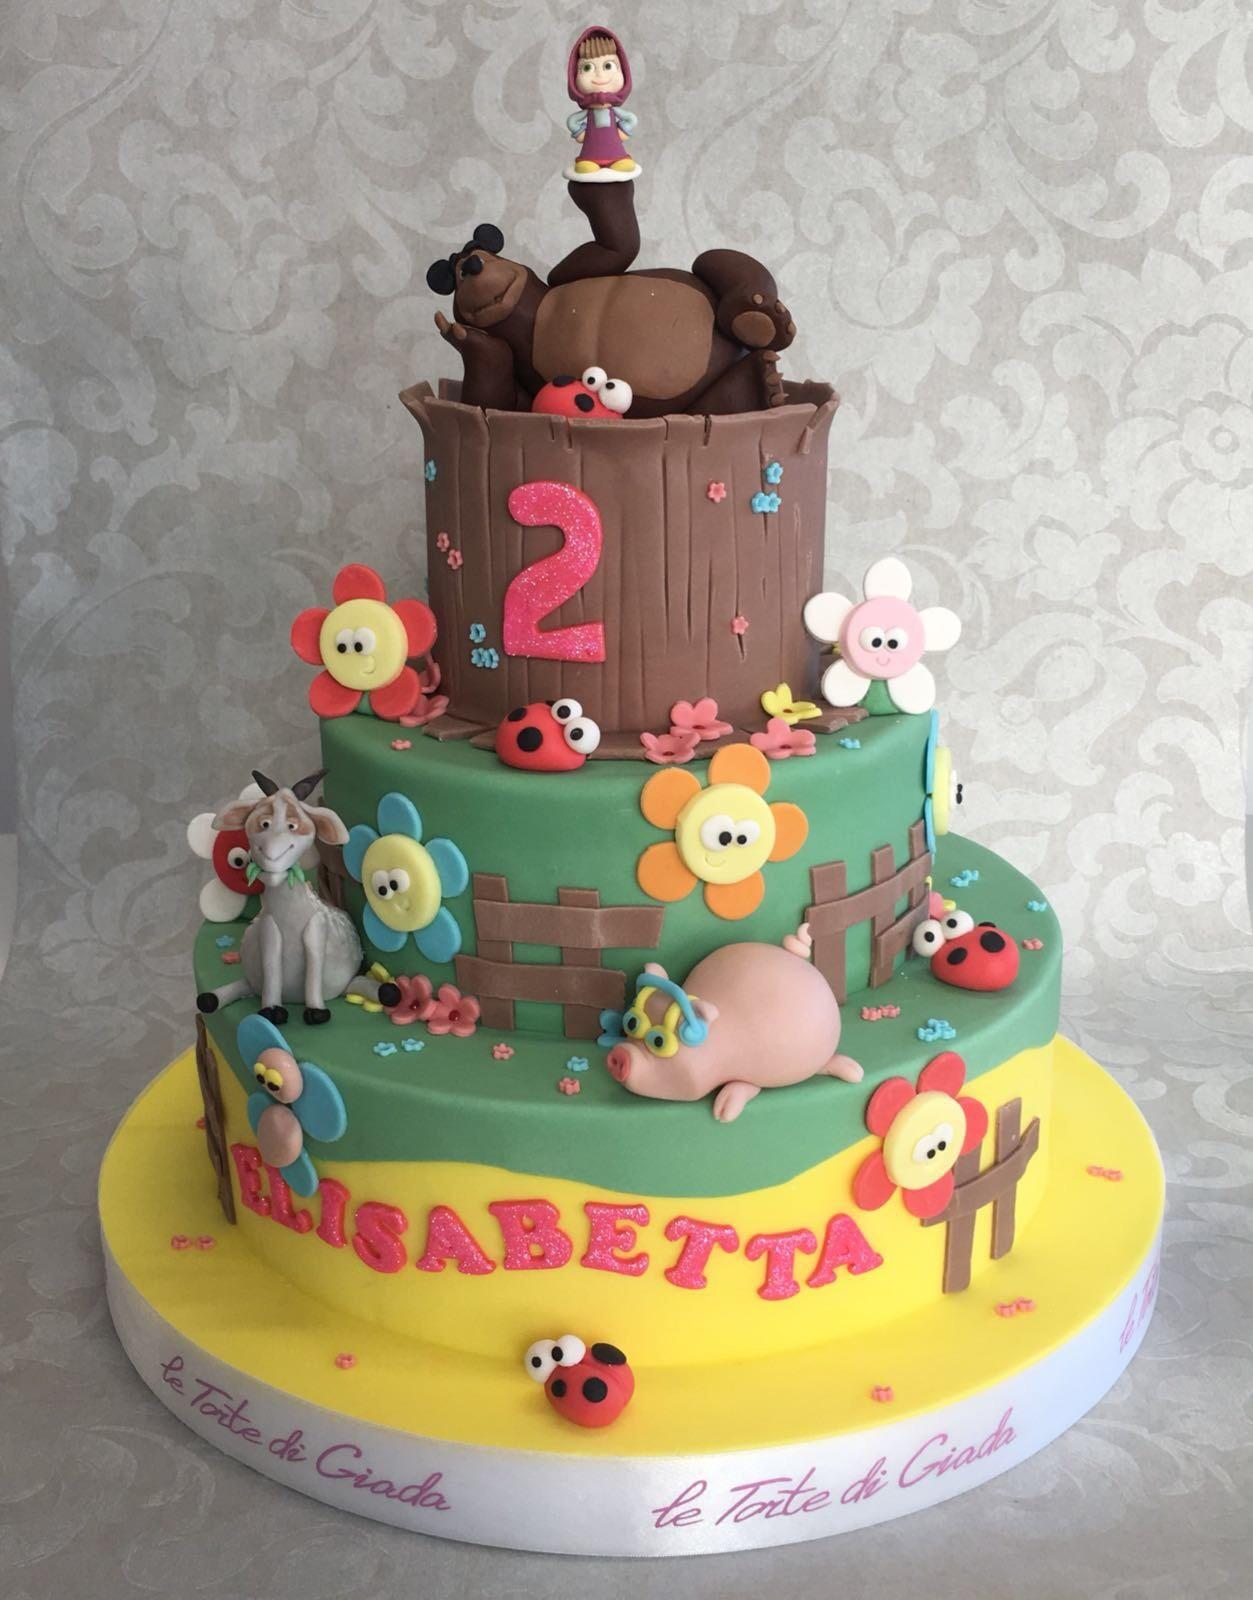 brescia torte di giada masha e orso